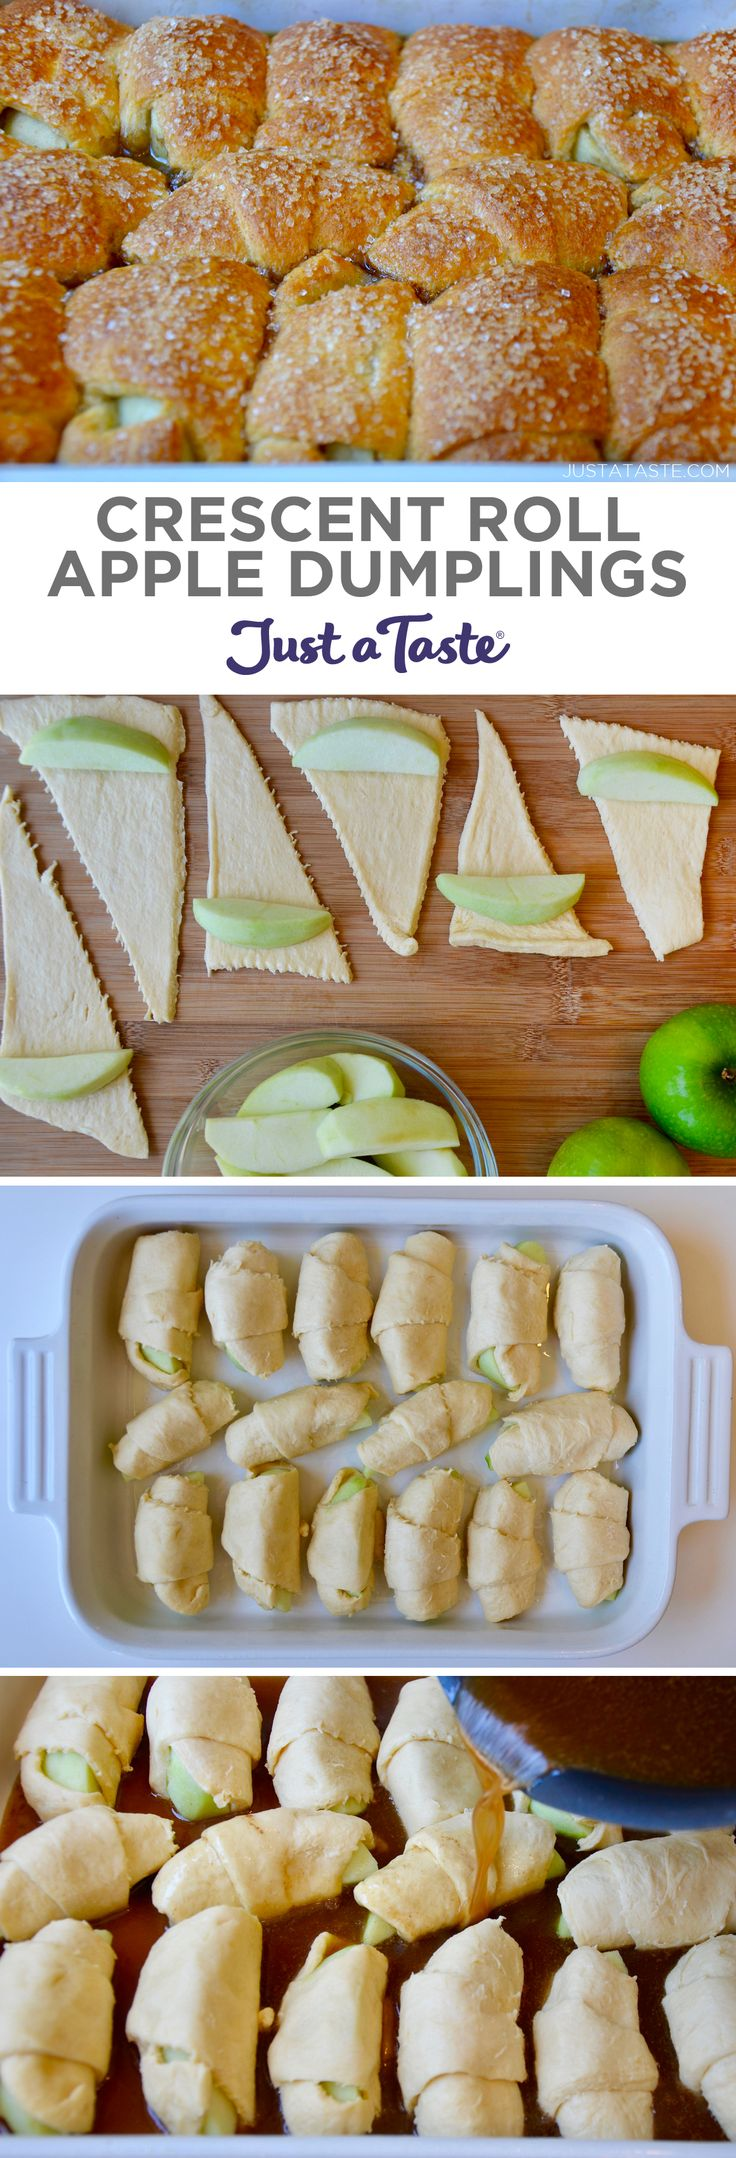 Crescent Roll Apple Dumplings recipe from justataste.com #recipes #fall #apple